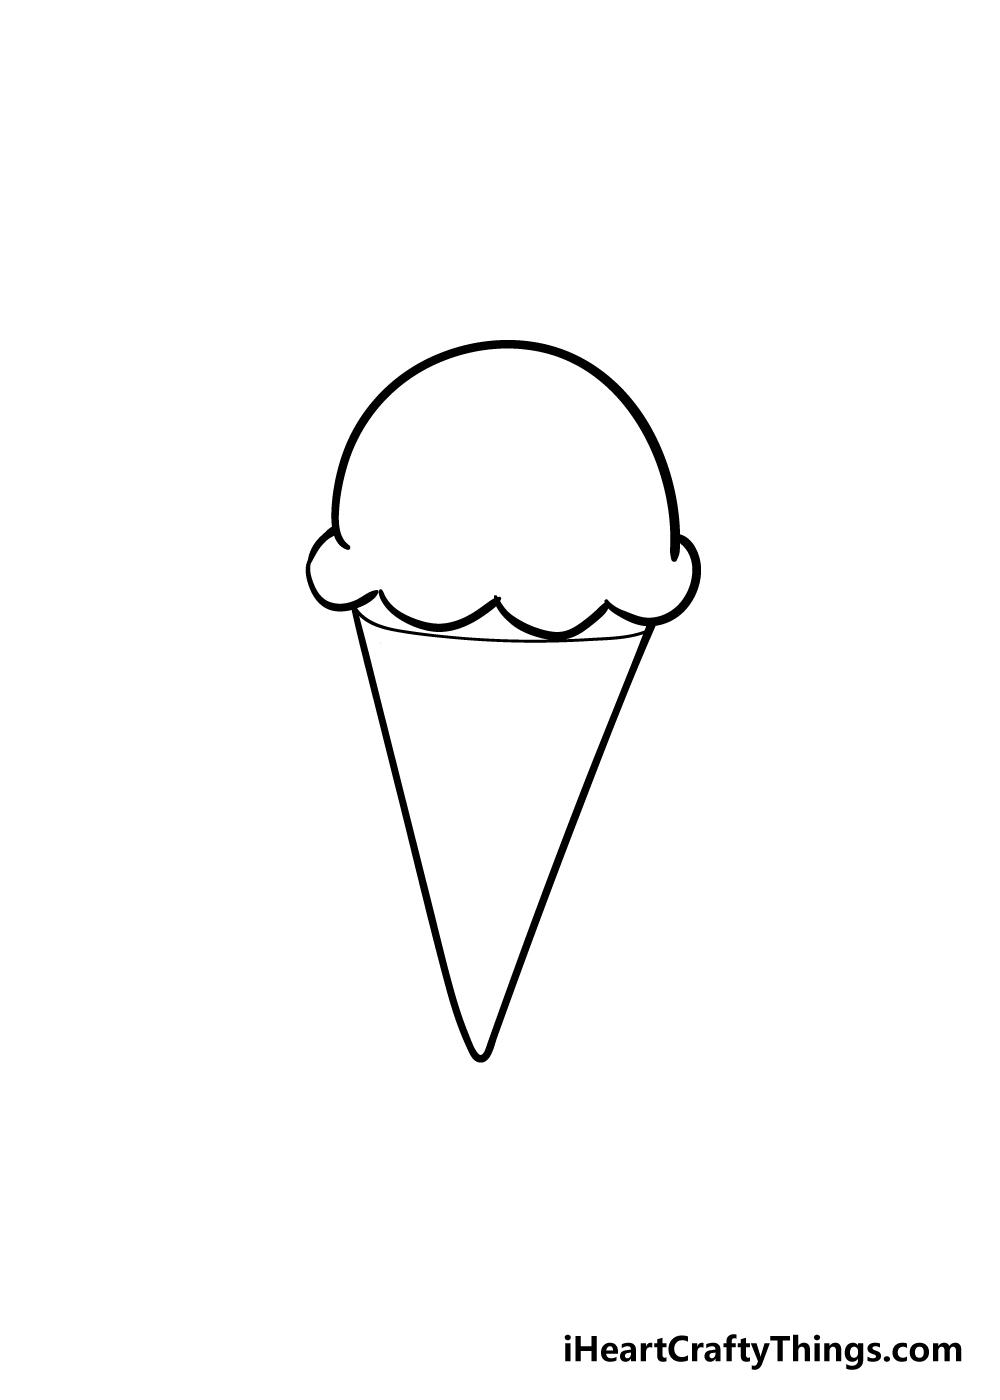 ice cream cone drawing step 2